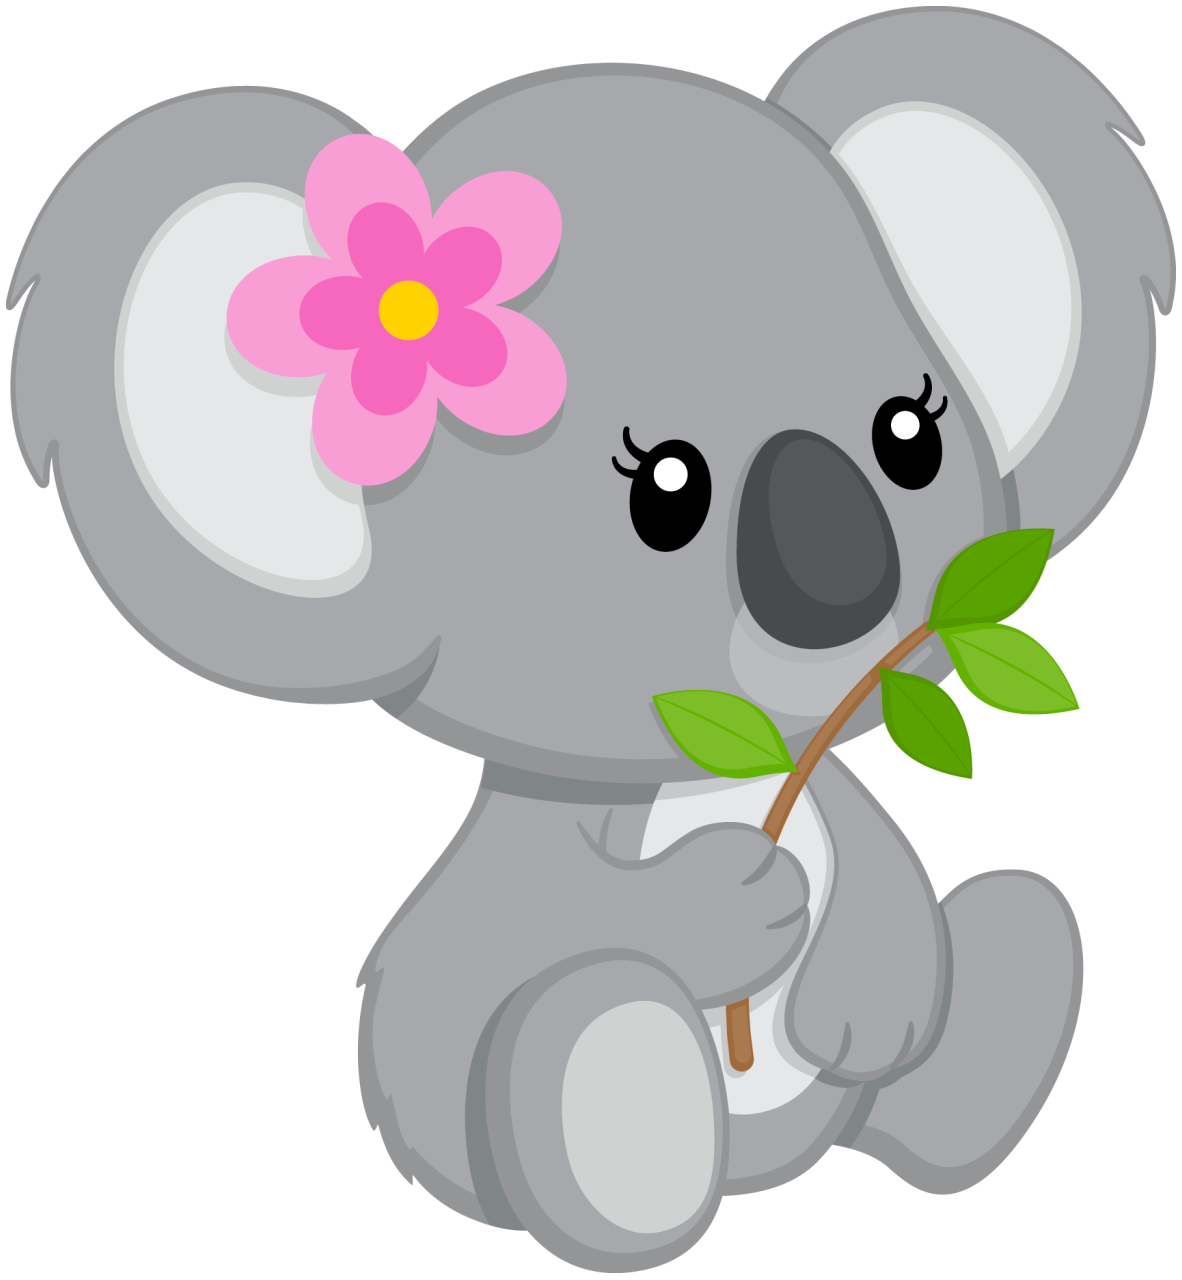 hight resolution of koala bear